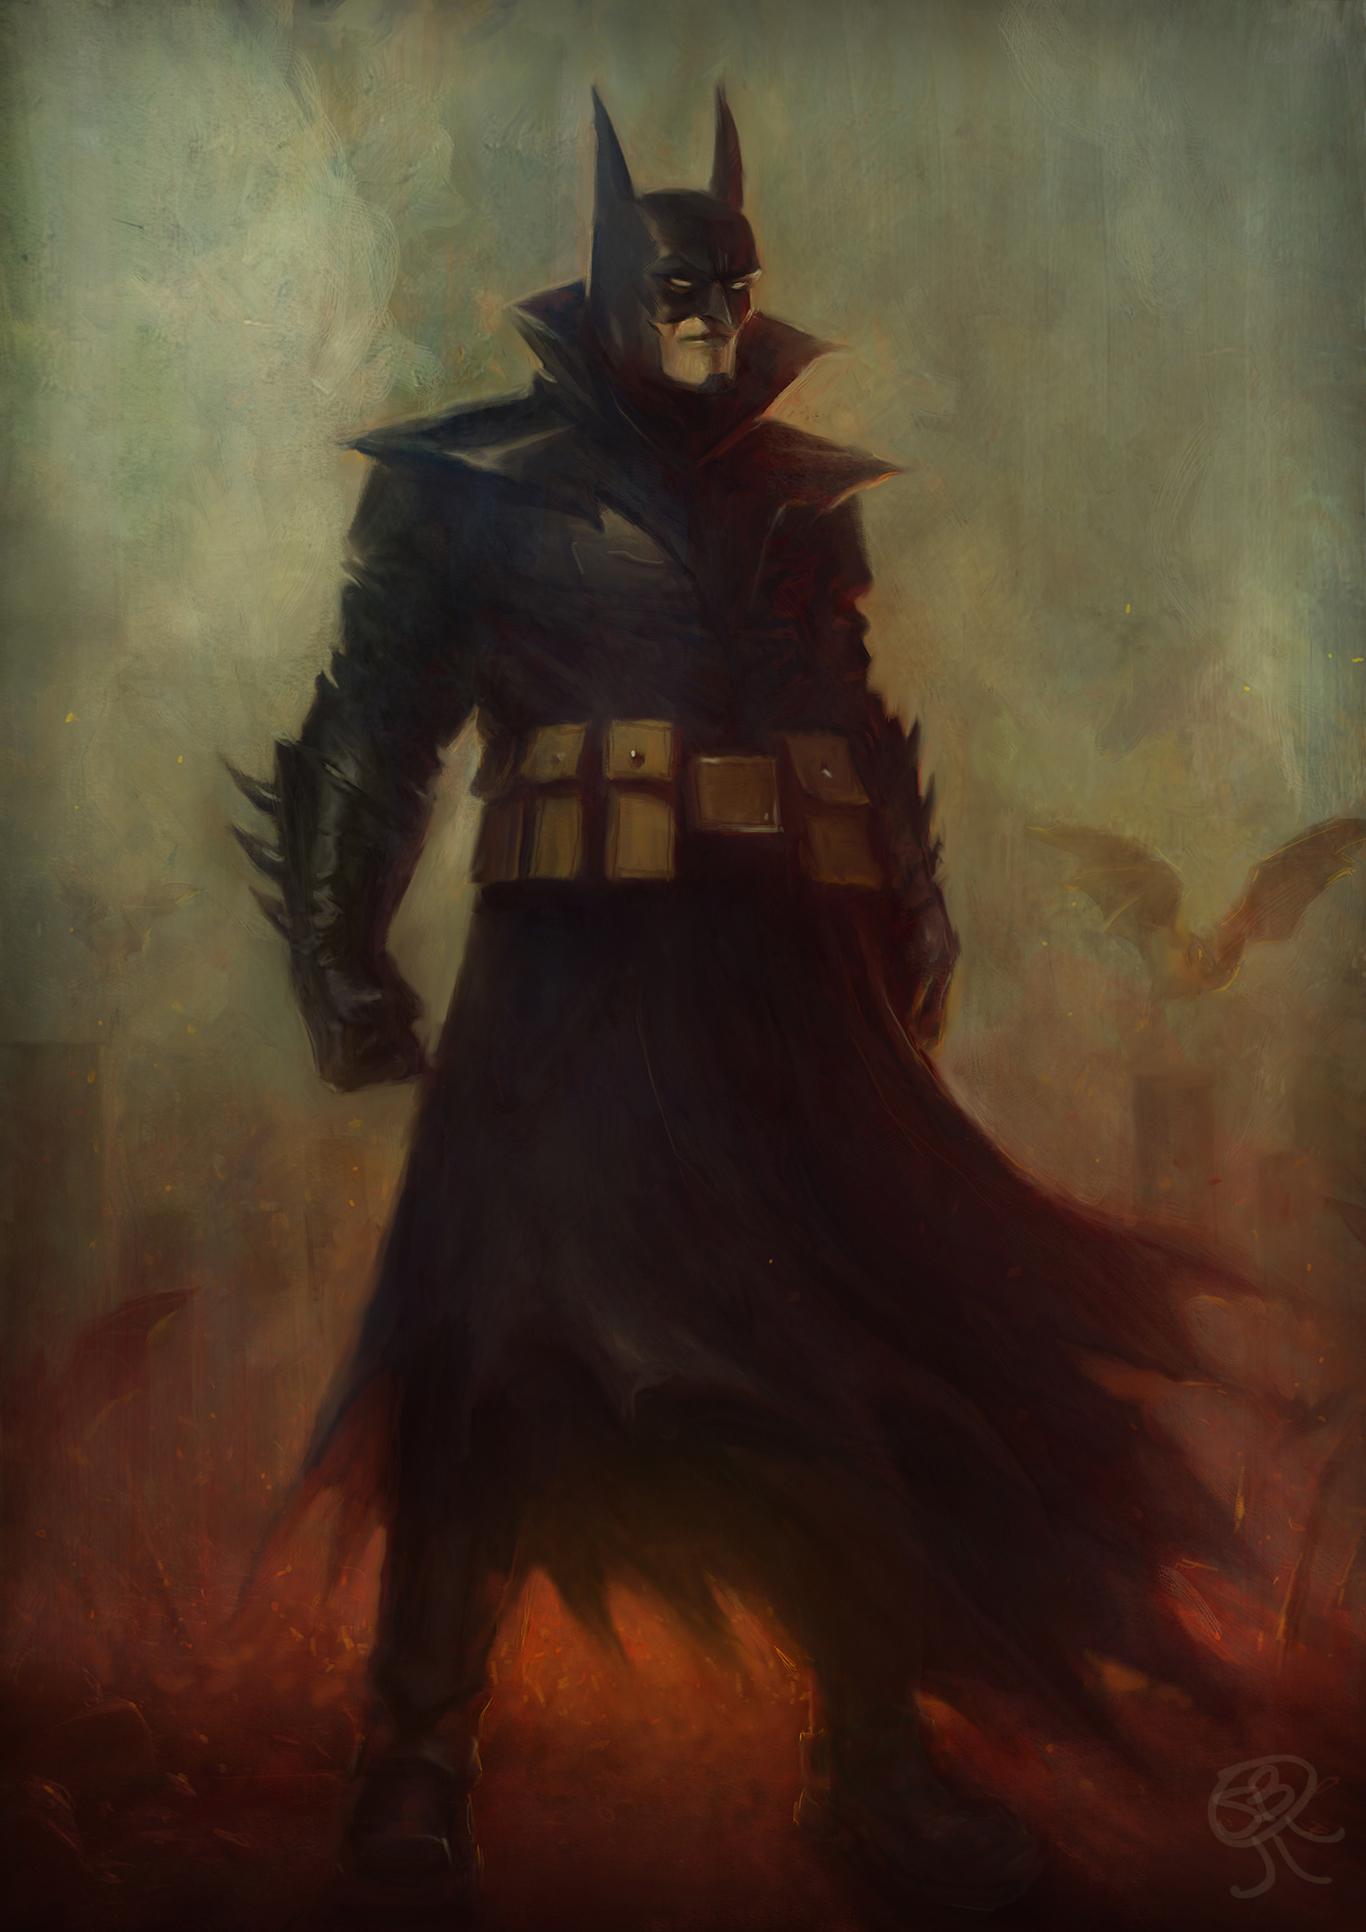 Papaninja batman number 666 fa 1 bb1e760c hy3i